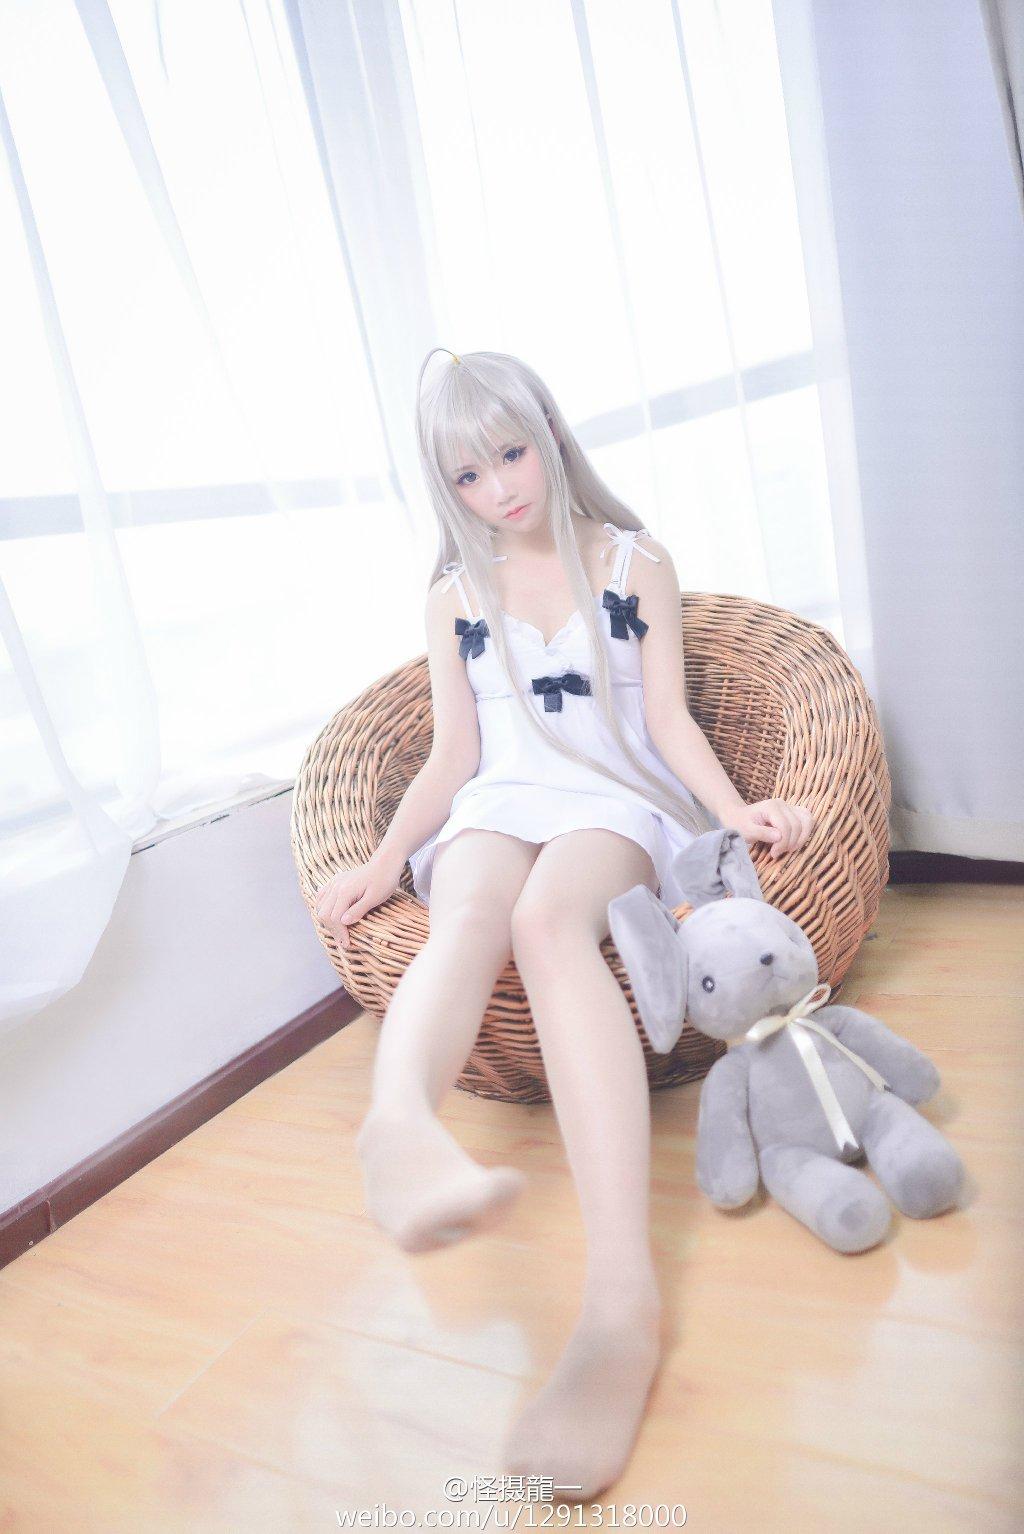 6gNc - Beautiful feet and legs 【2019.04.26】